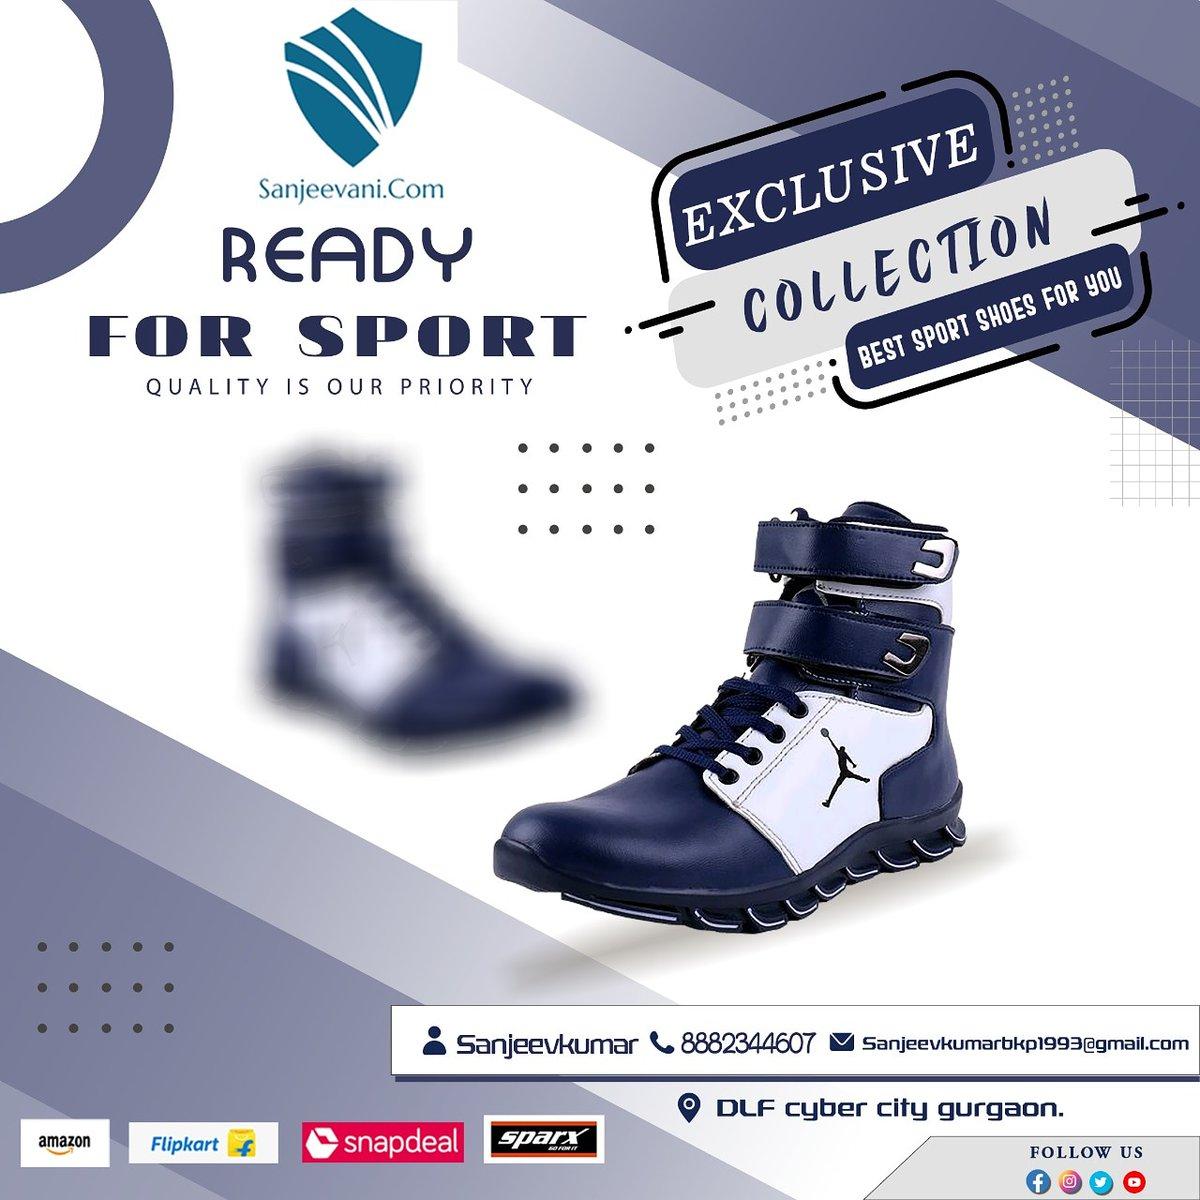 #shoes #fashion #style #sneakers #love #shopping #moda #nike #instagood #like #shoesaddict #heels #follow #outfit #dress #onlineshopping #ootd #instagram #bags #instafashion #fashionblogger #stylish #model #adidas #photooftheday #bhfyp #fashionista #clothes #fashionstyle #bhfyp